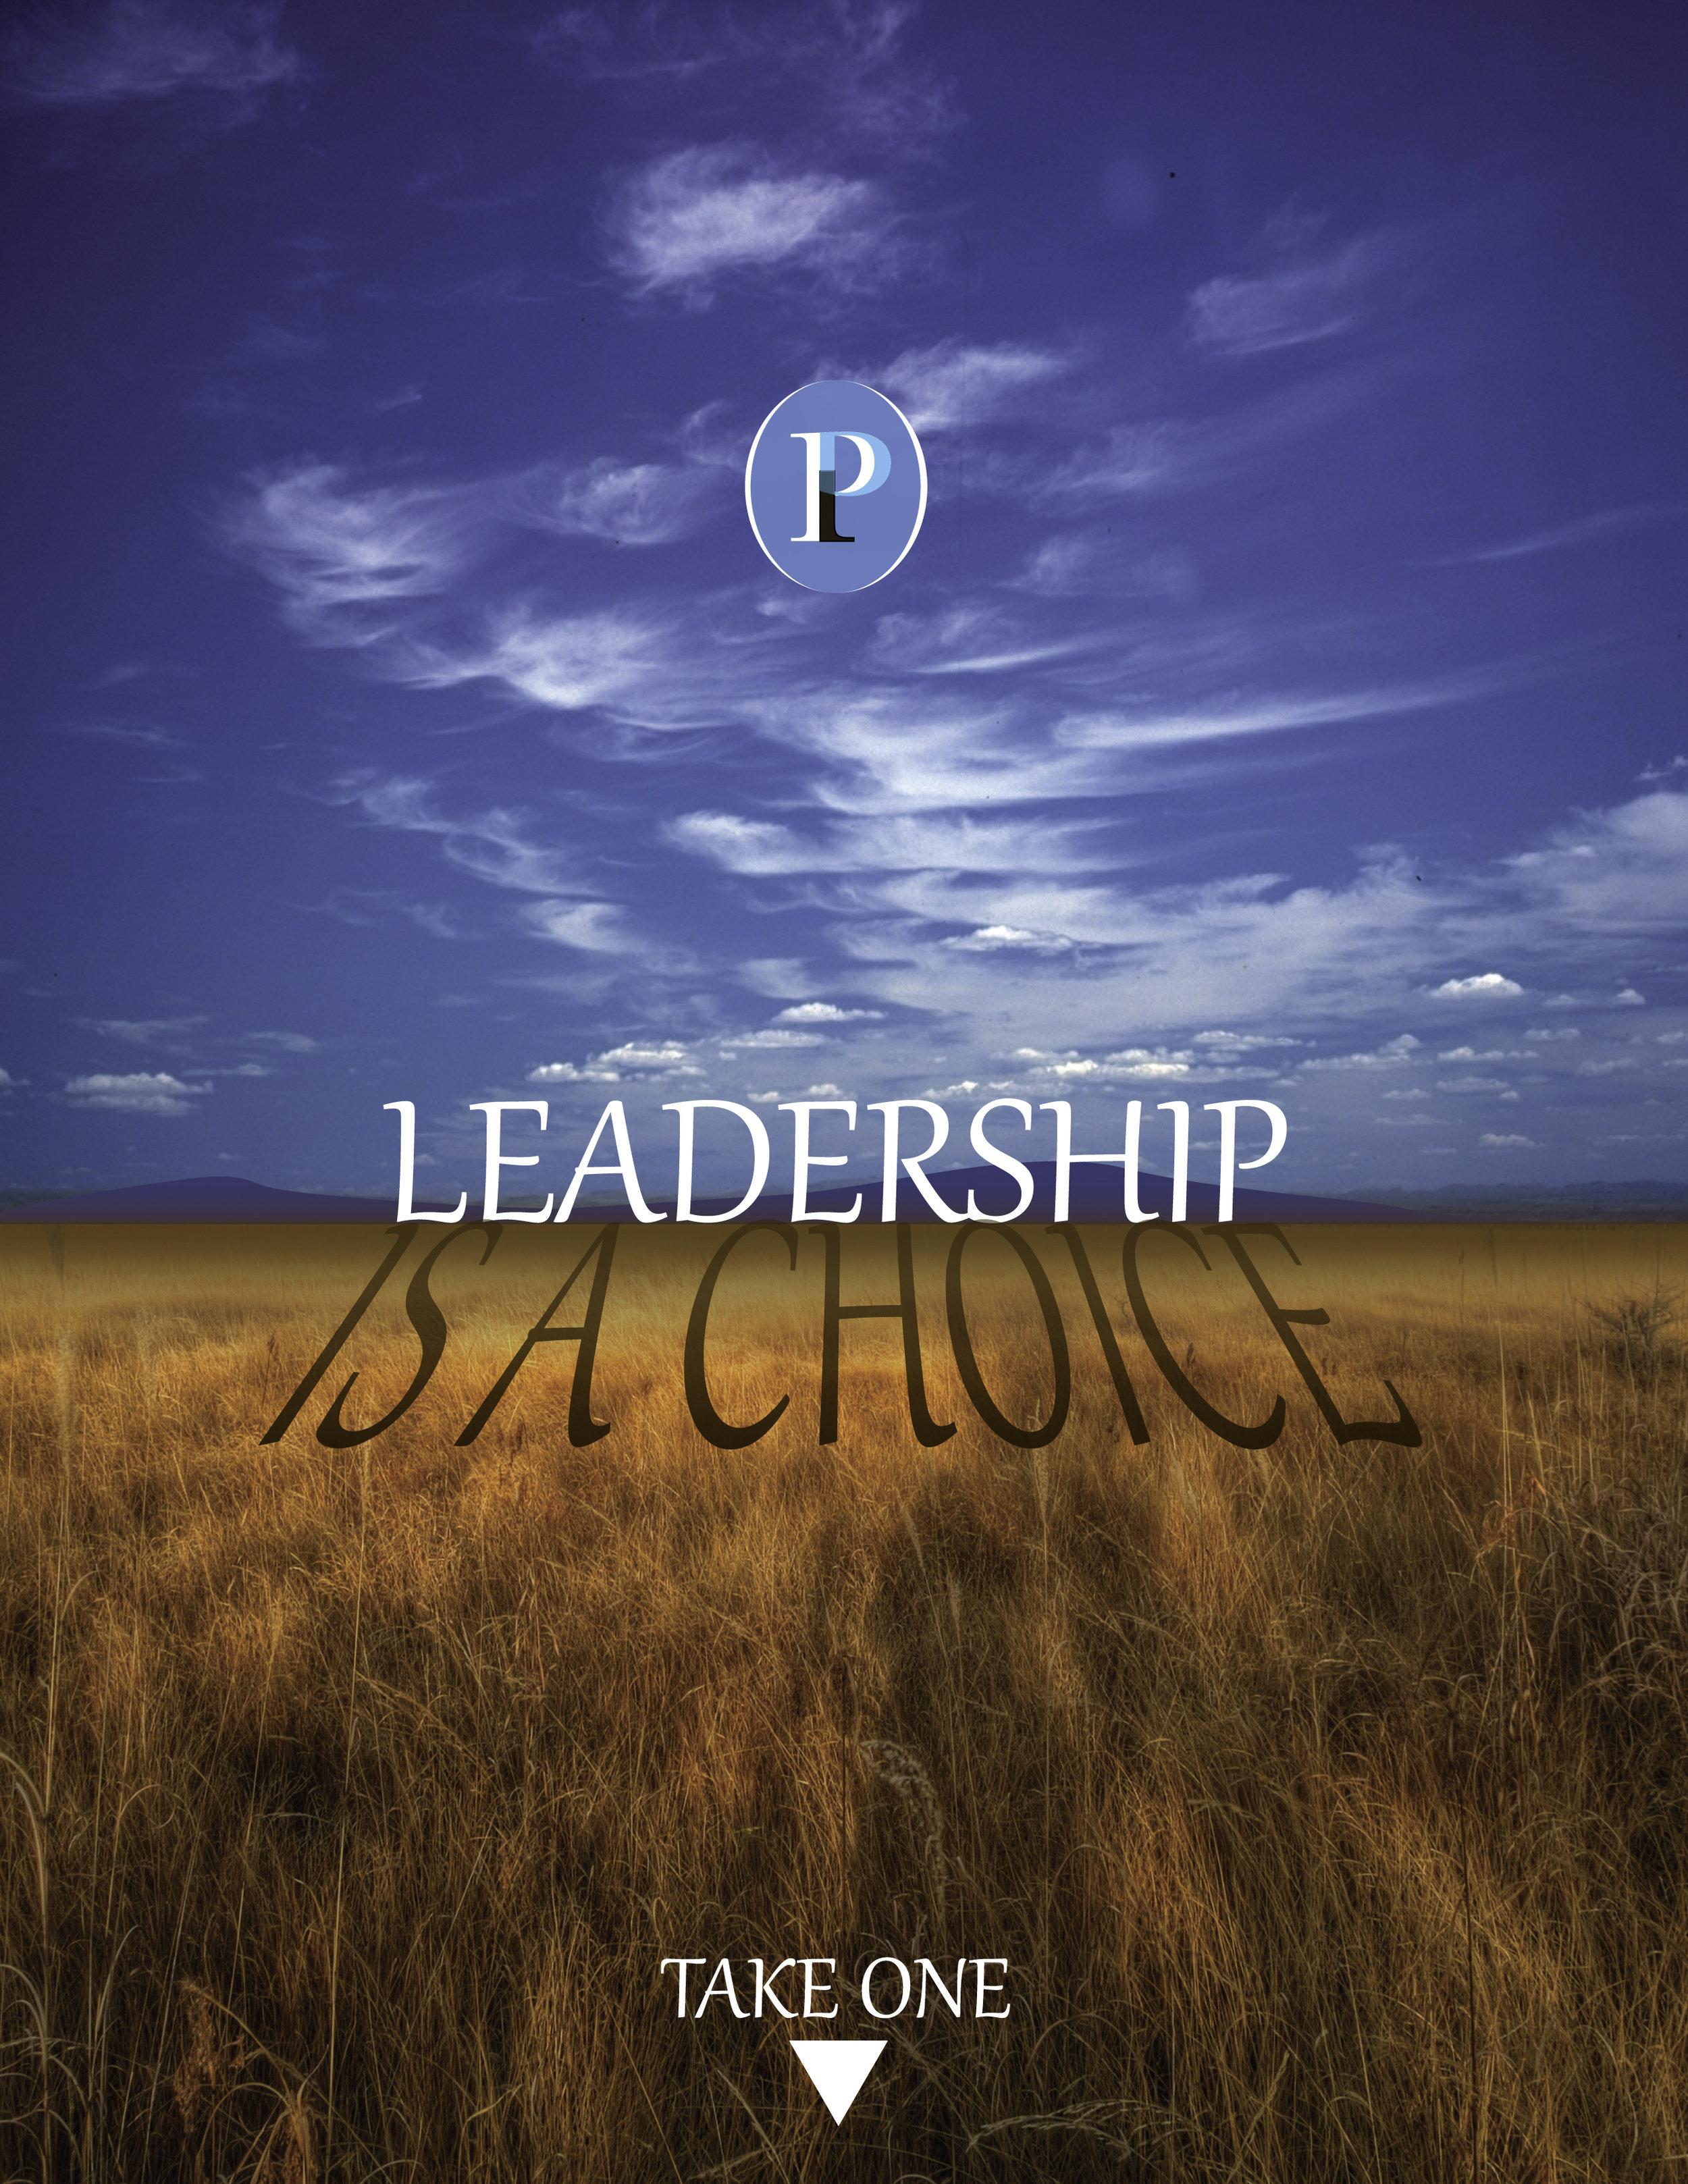 Leadership is Choice.jpg